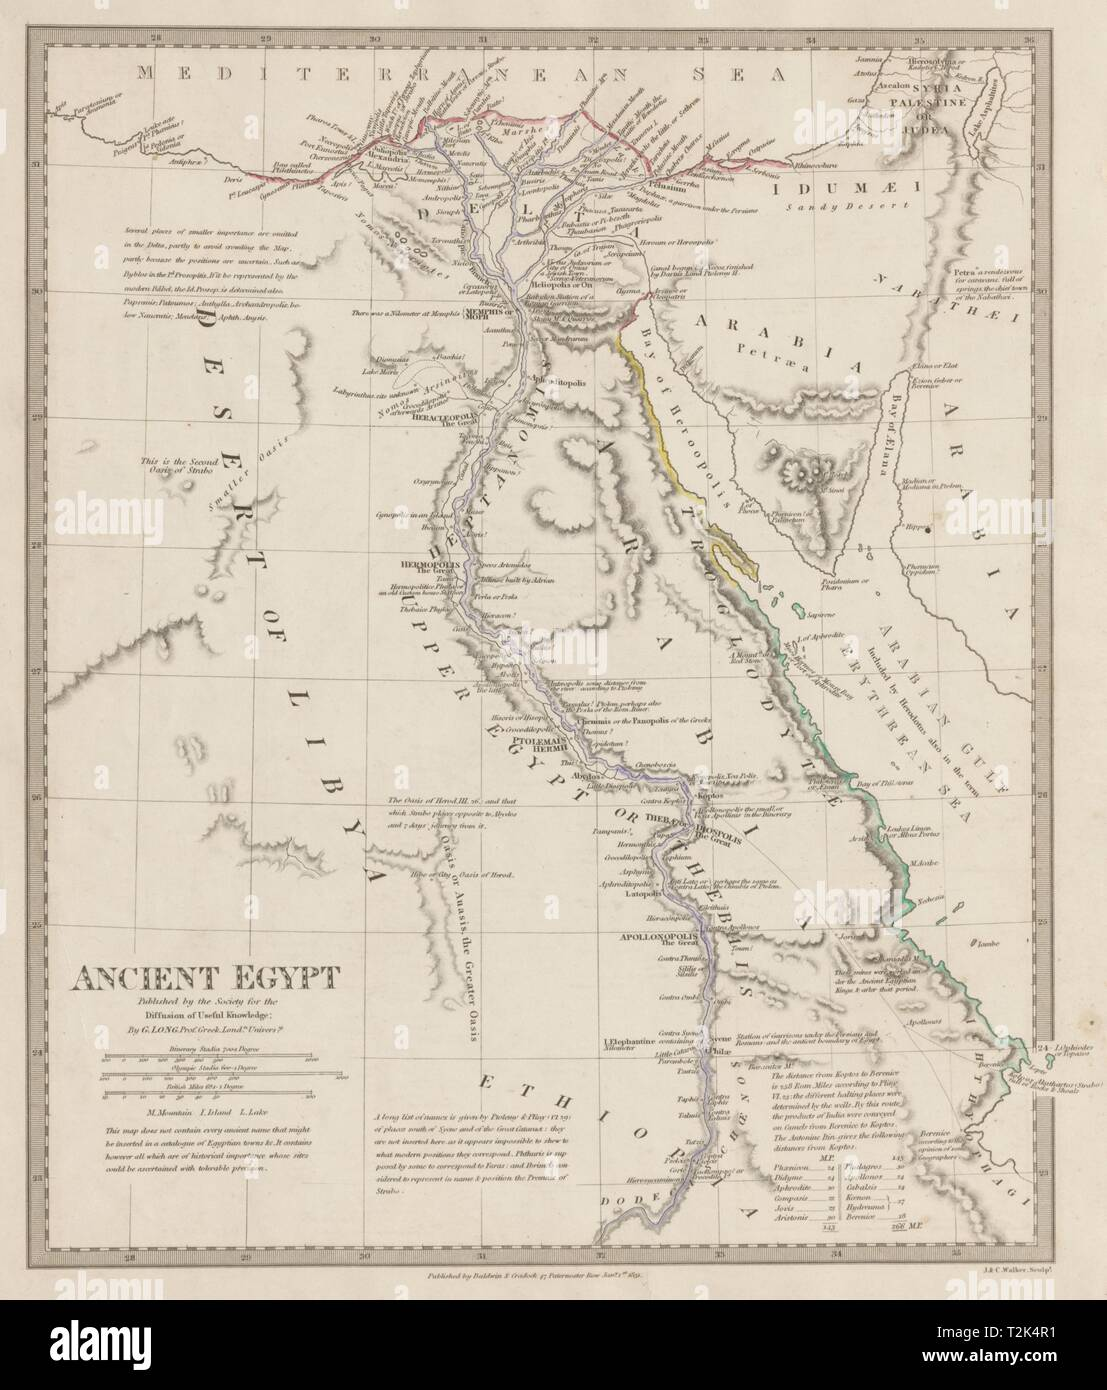 ANCIENT EGYPT & Nile Valley. Ancient place names. Original ...